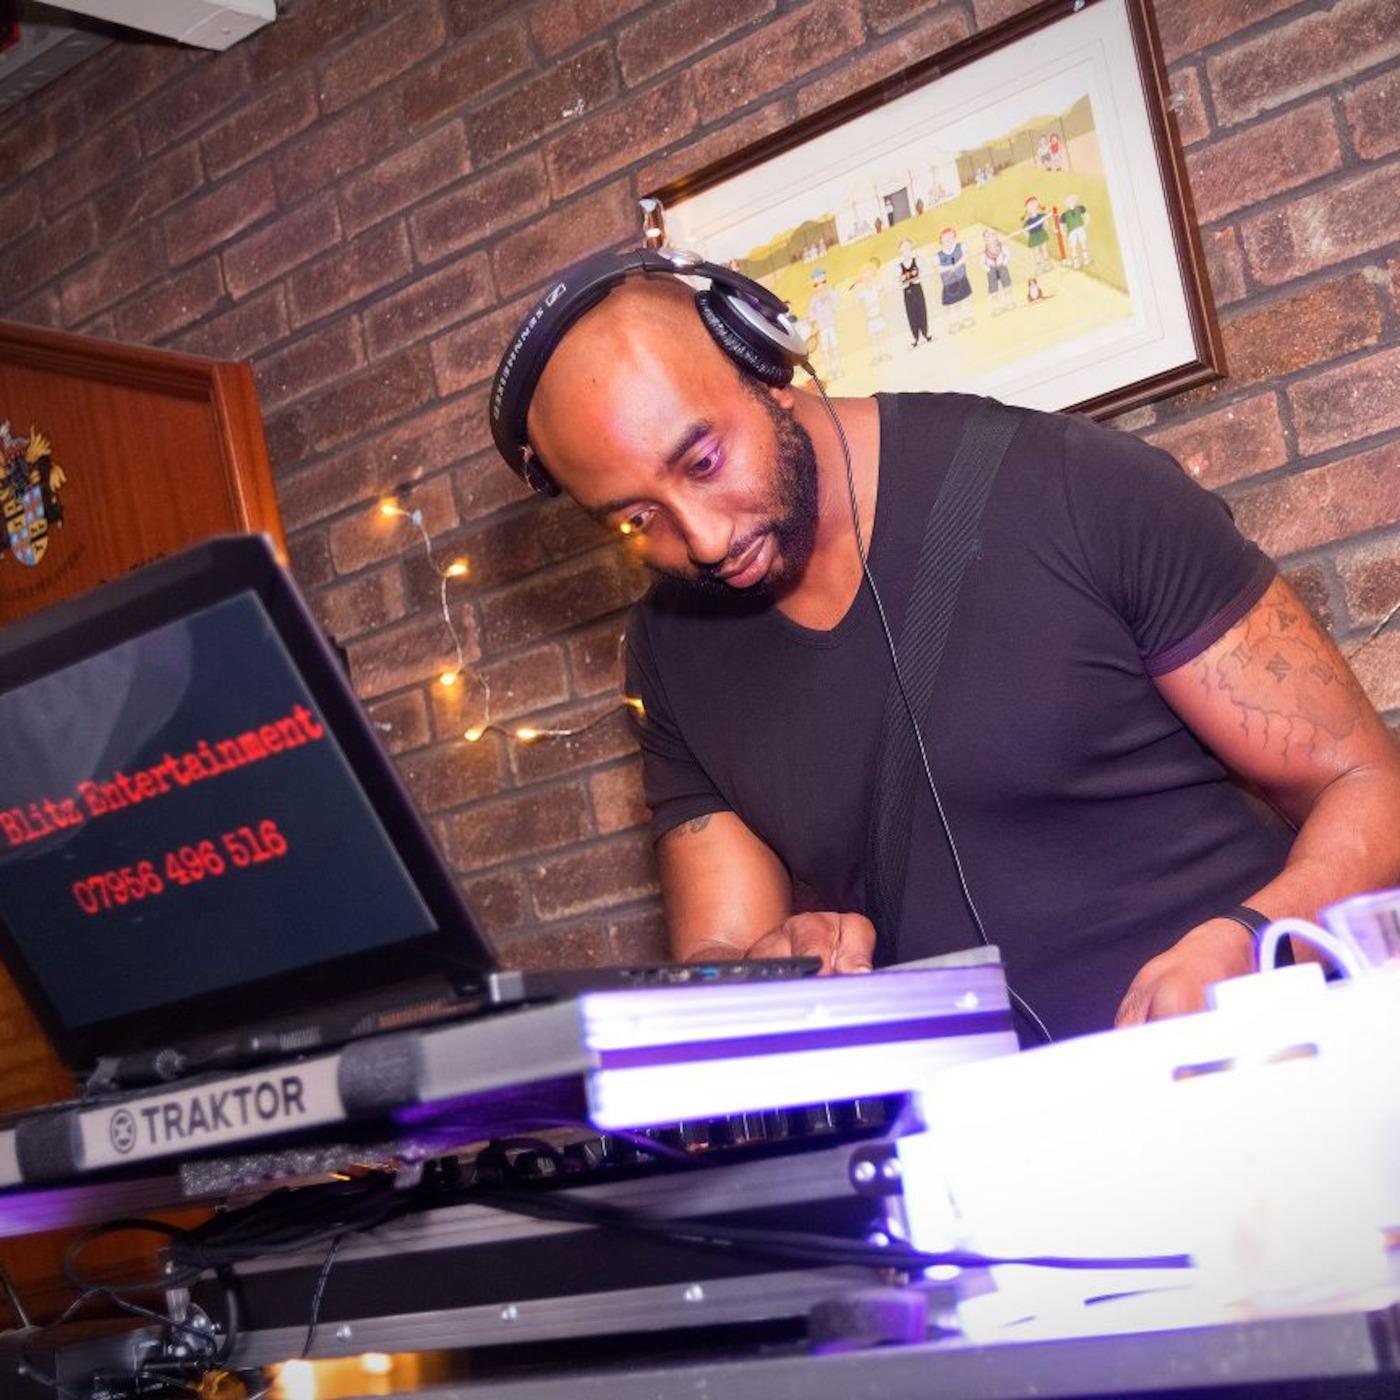 DJ Blitz in the mix - UK, R&B, Hip Hop, Dancehall, Reggae